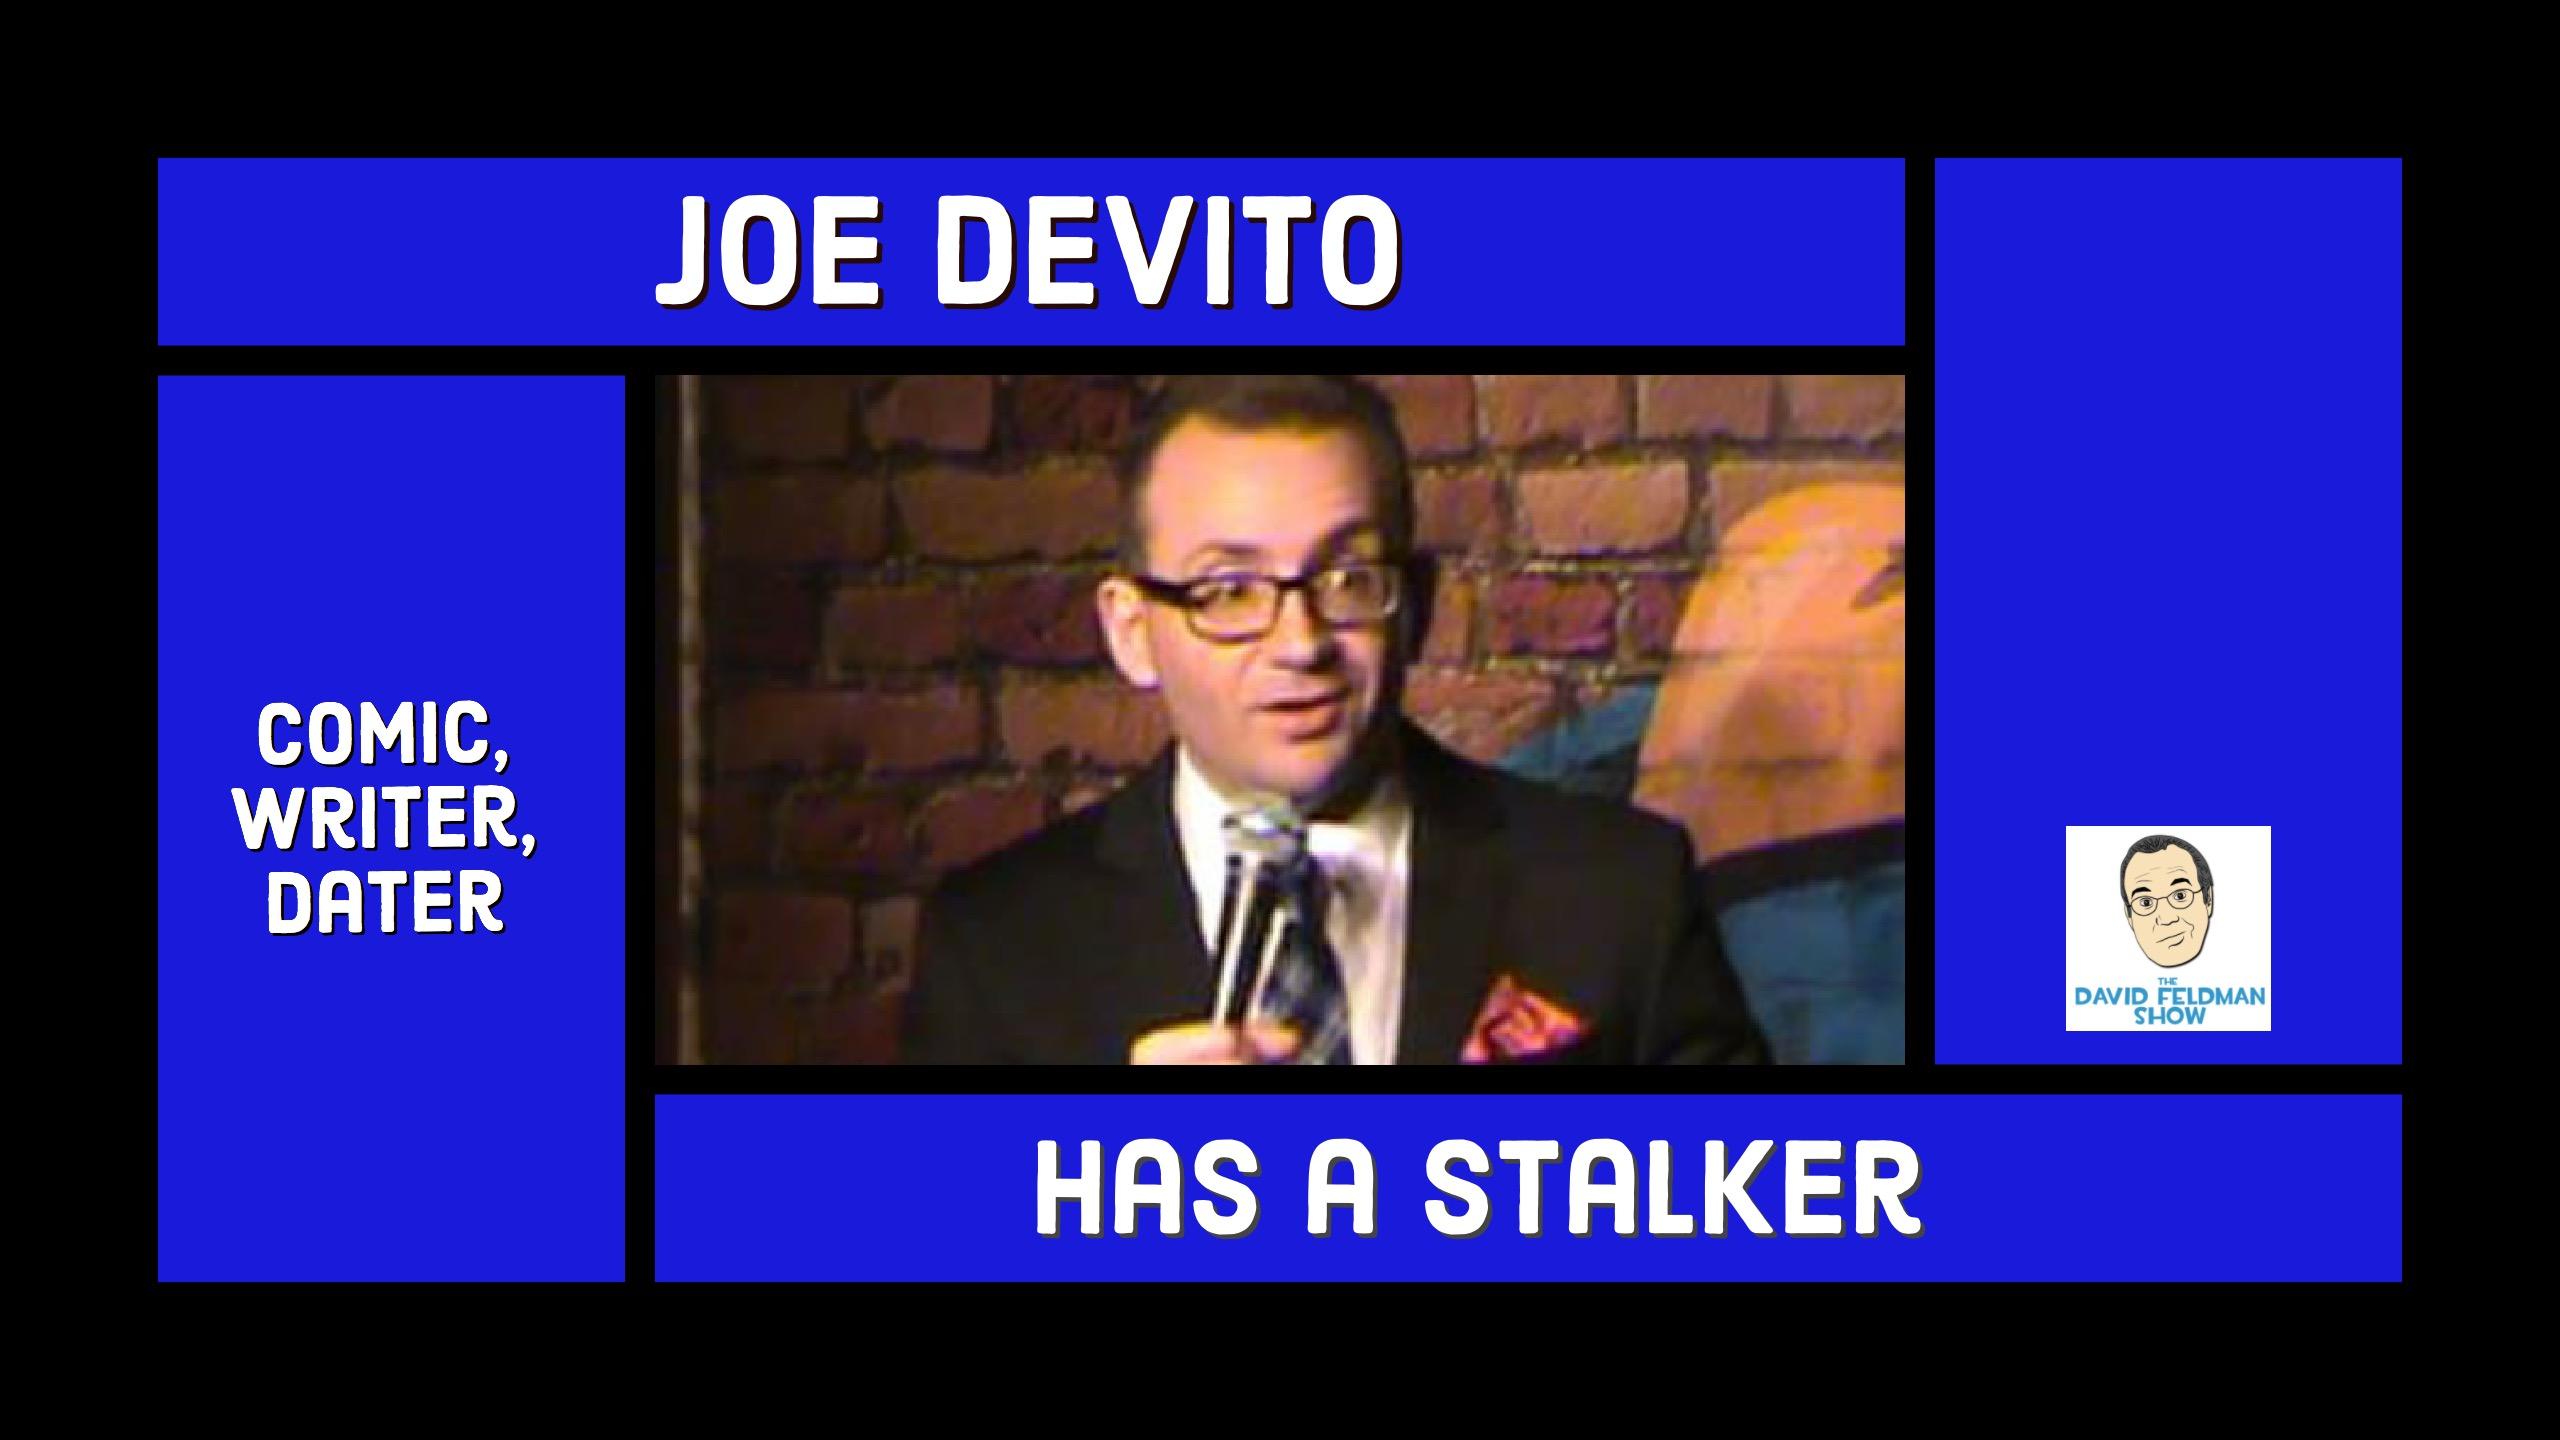 Joe DeVito has a stalker